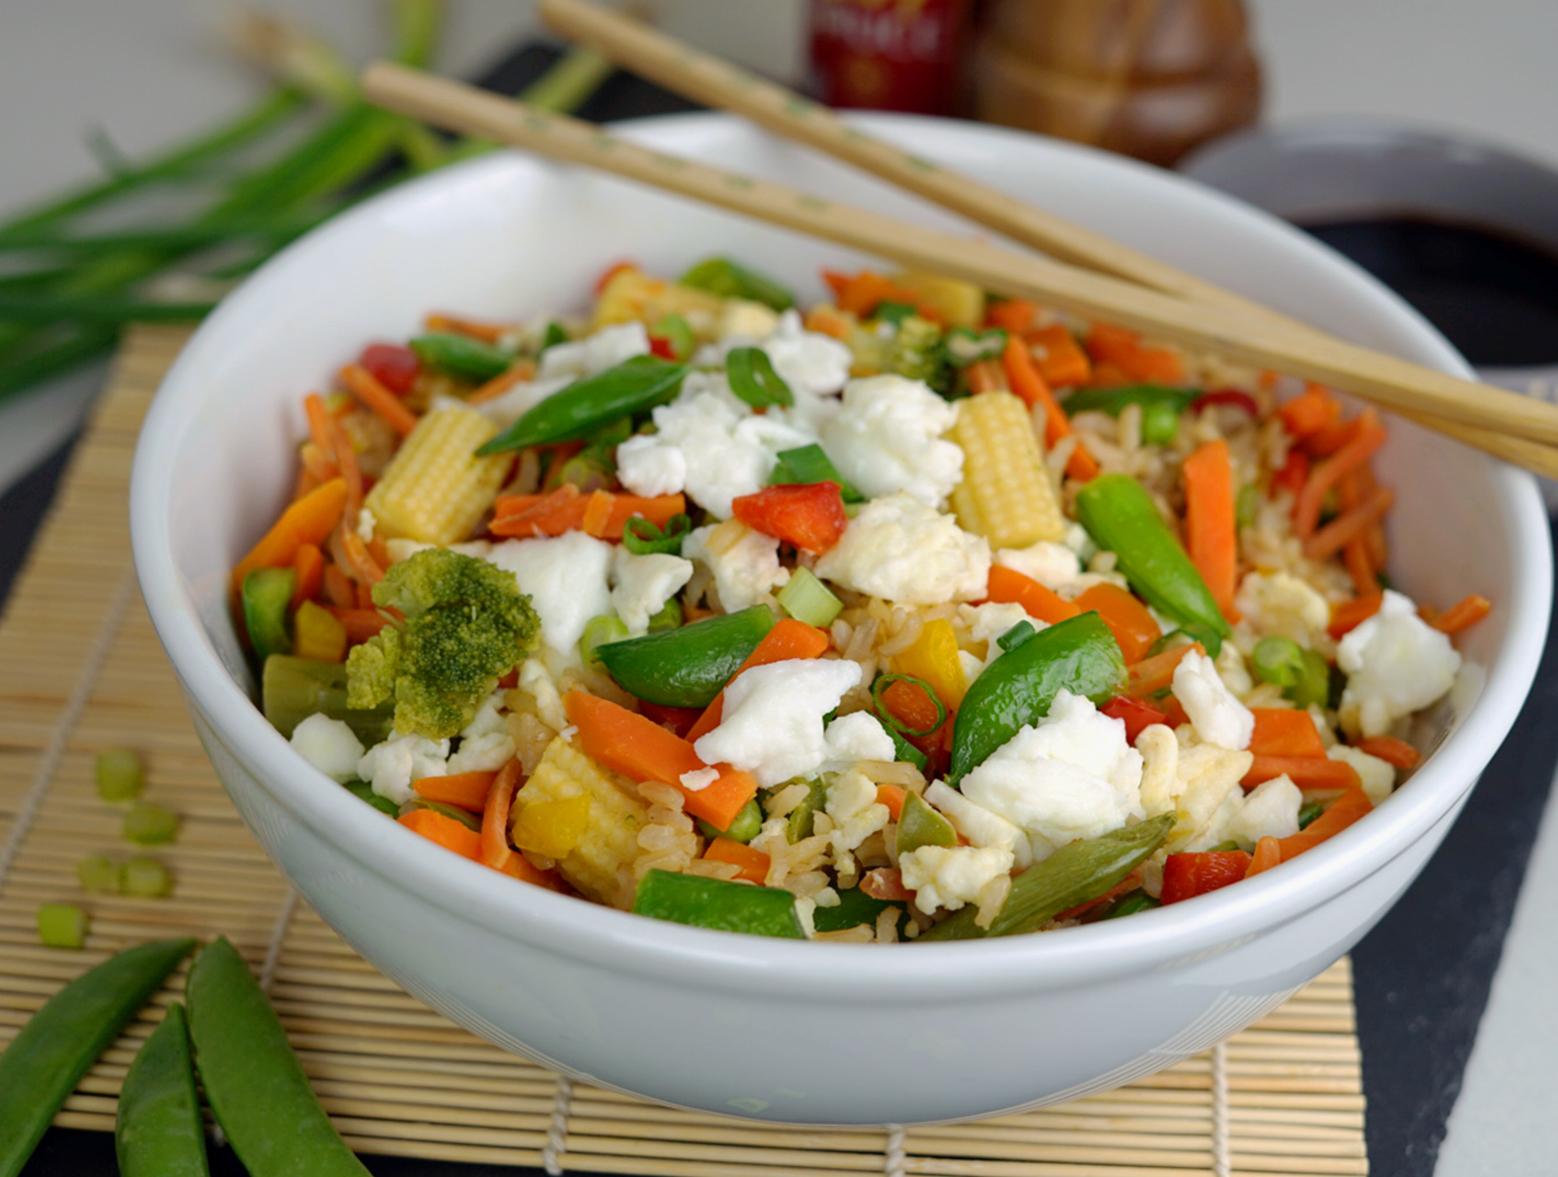 photo of prepared Veggie Fried Rice recipe